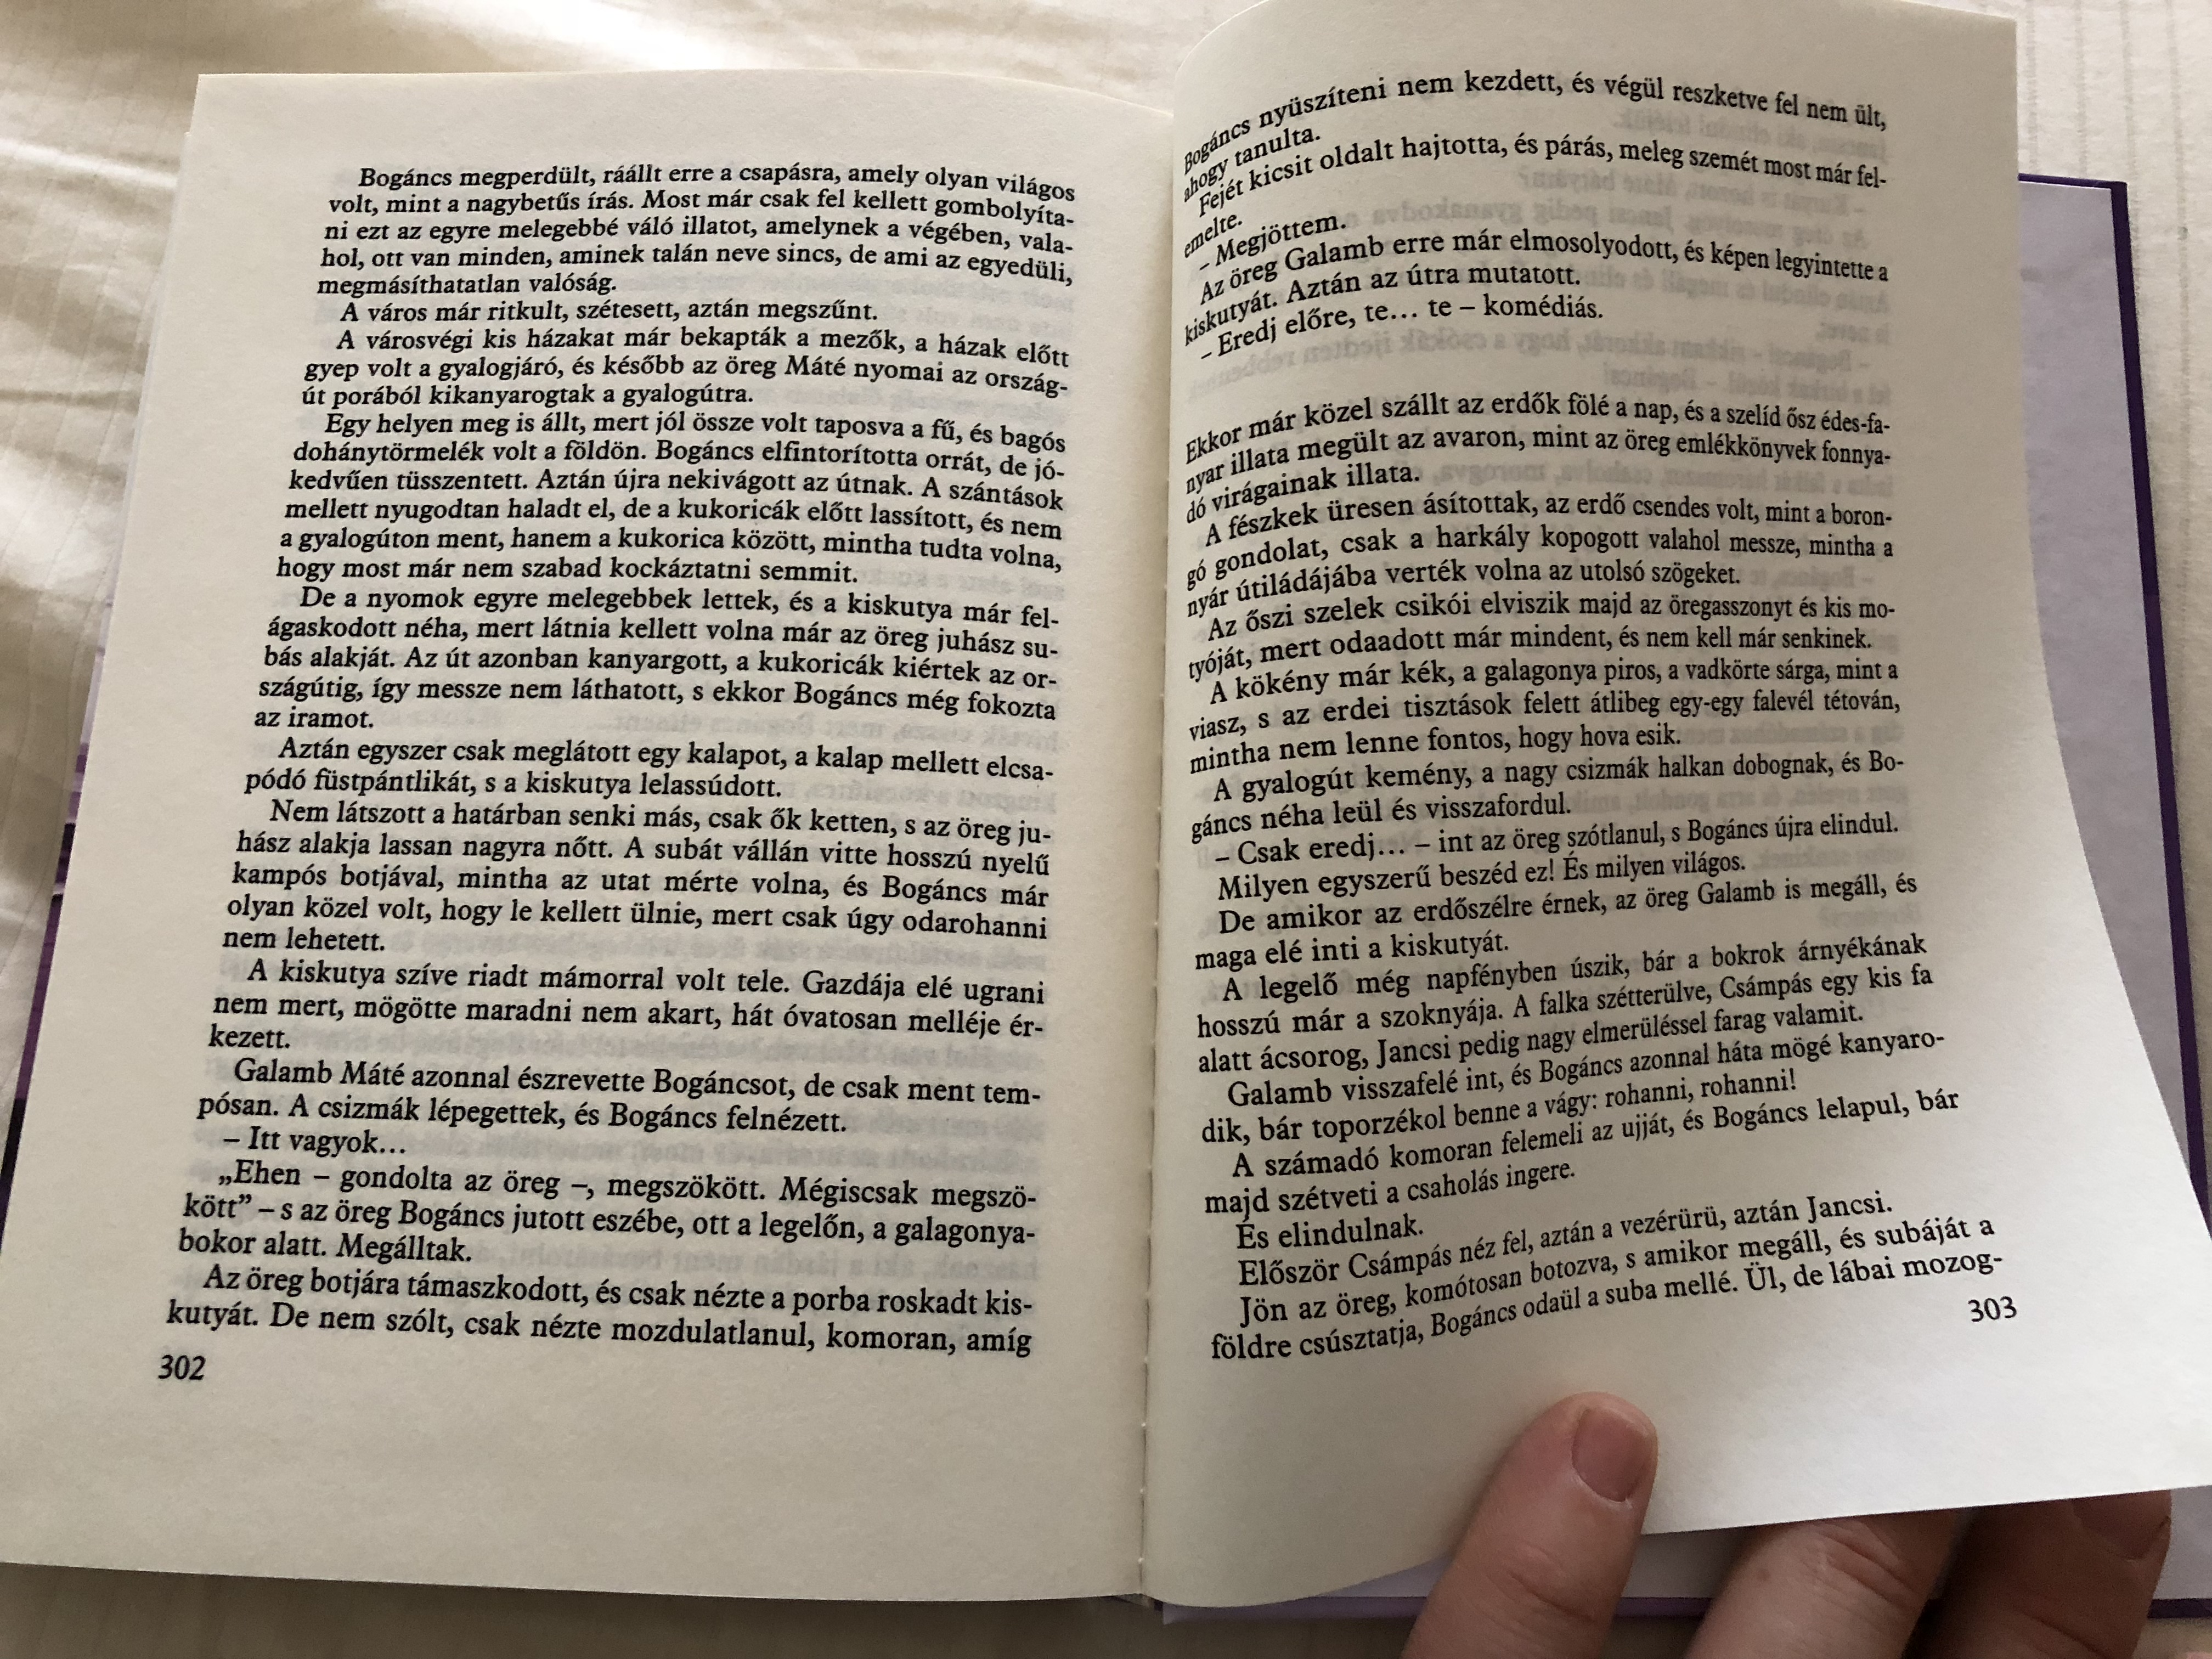 bog-ncs-by-fekete-istv-n-m-ra-k-nyvkiad-2015-hardcover-hungarian-literary-classic-8-.jpg